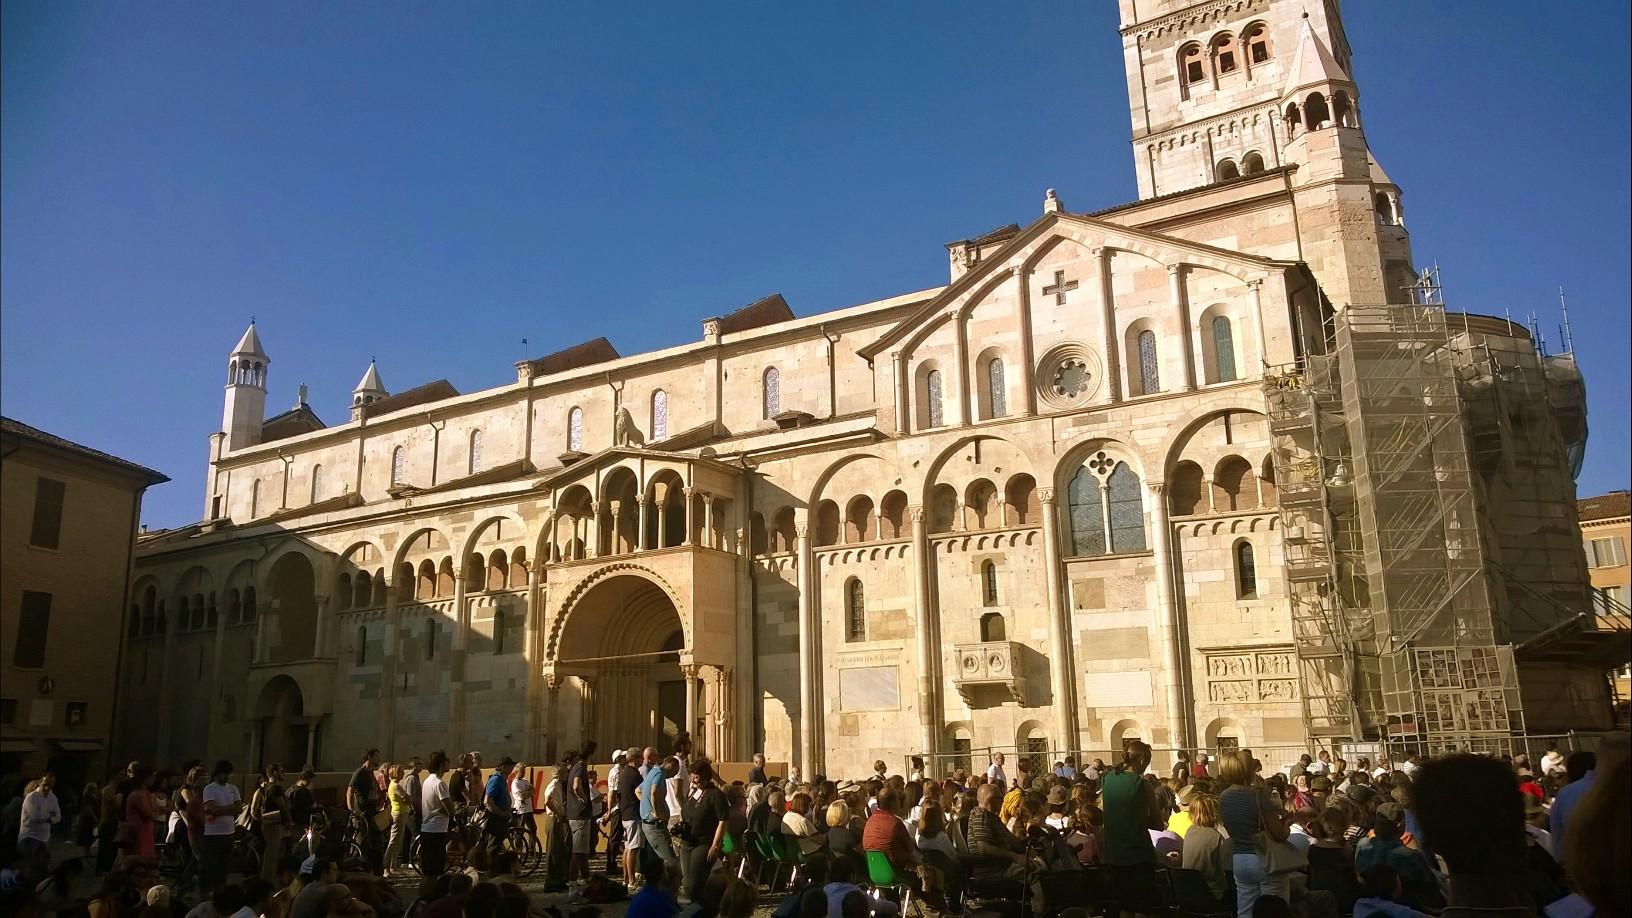 Modena festivalfilosofia 2014